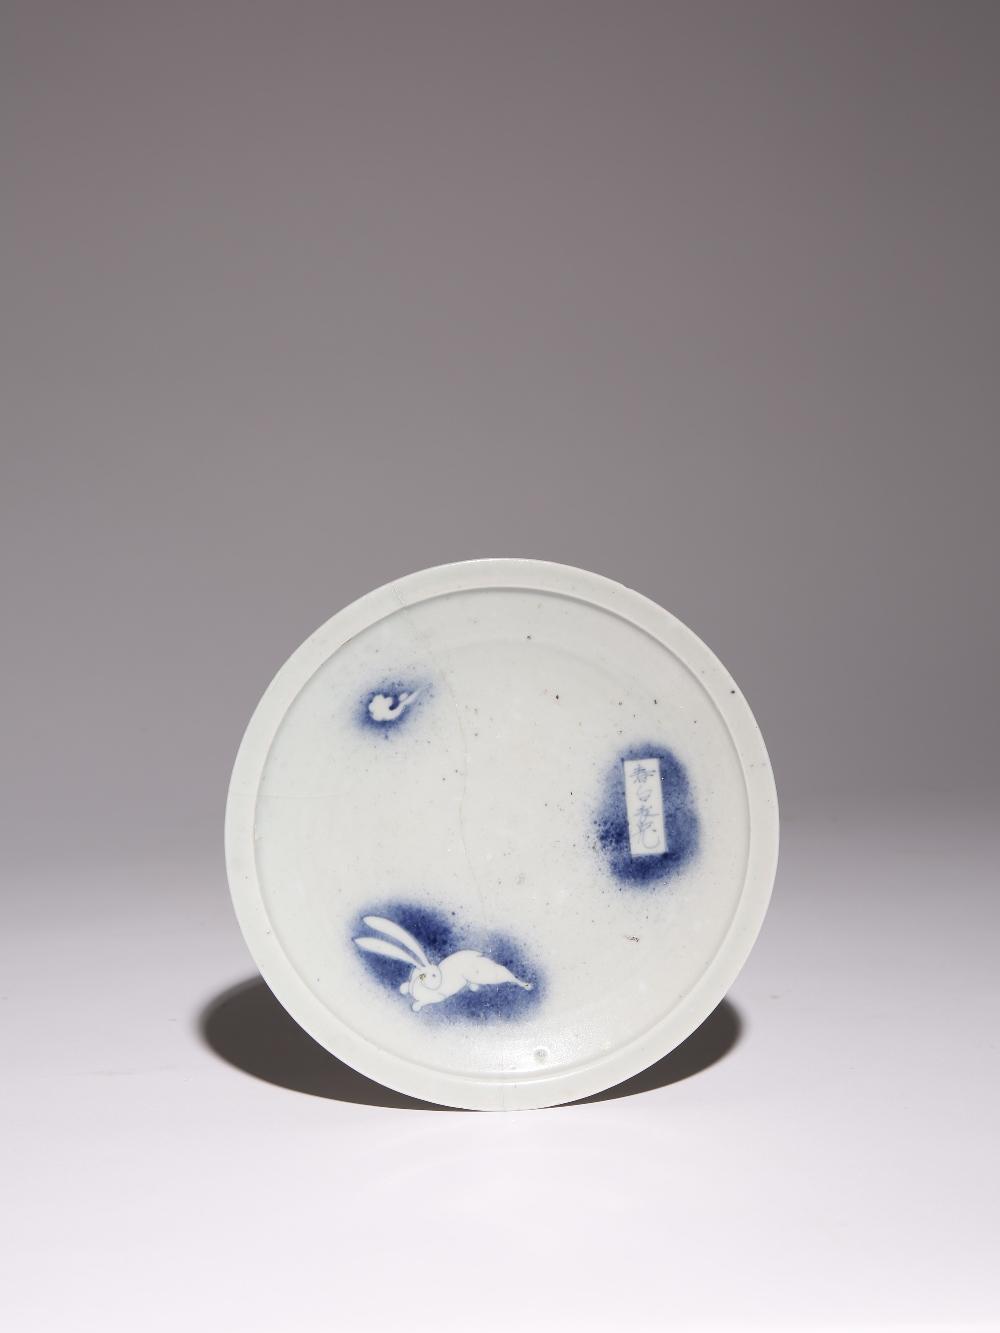 A JAPANESE SHOKI-IMARI DISH EDO PERIOD, C.1630-40 The well decorated in underglaze cobalt blue